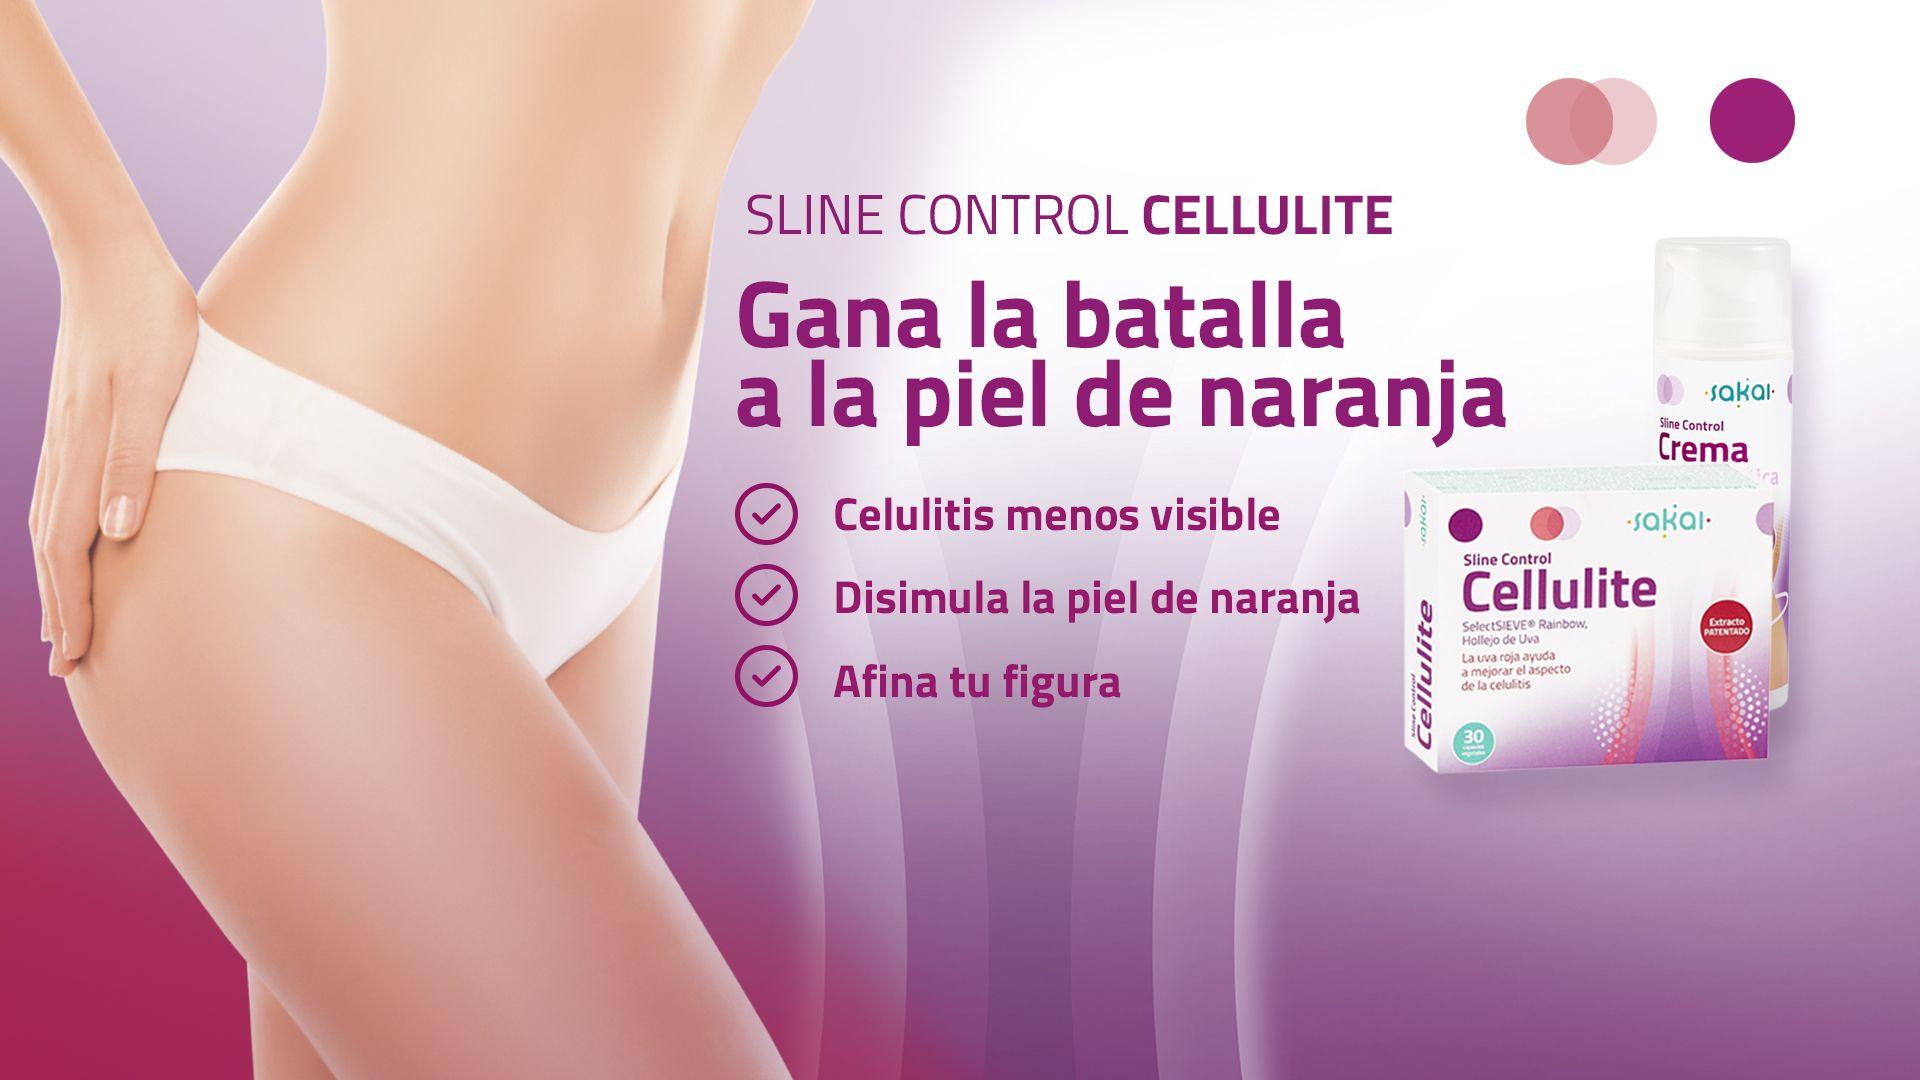 Sline Control Cellulite gana la batalla a la piel de naranja y a la celulitis